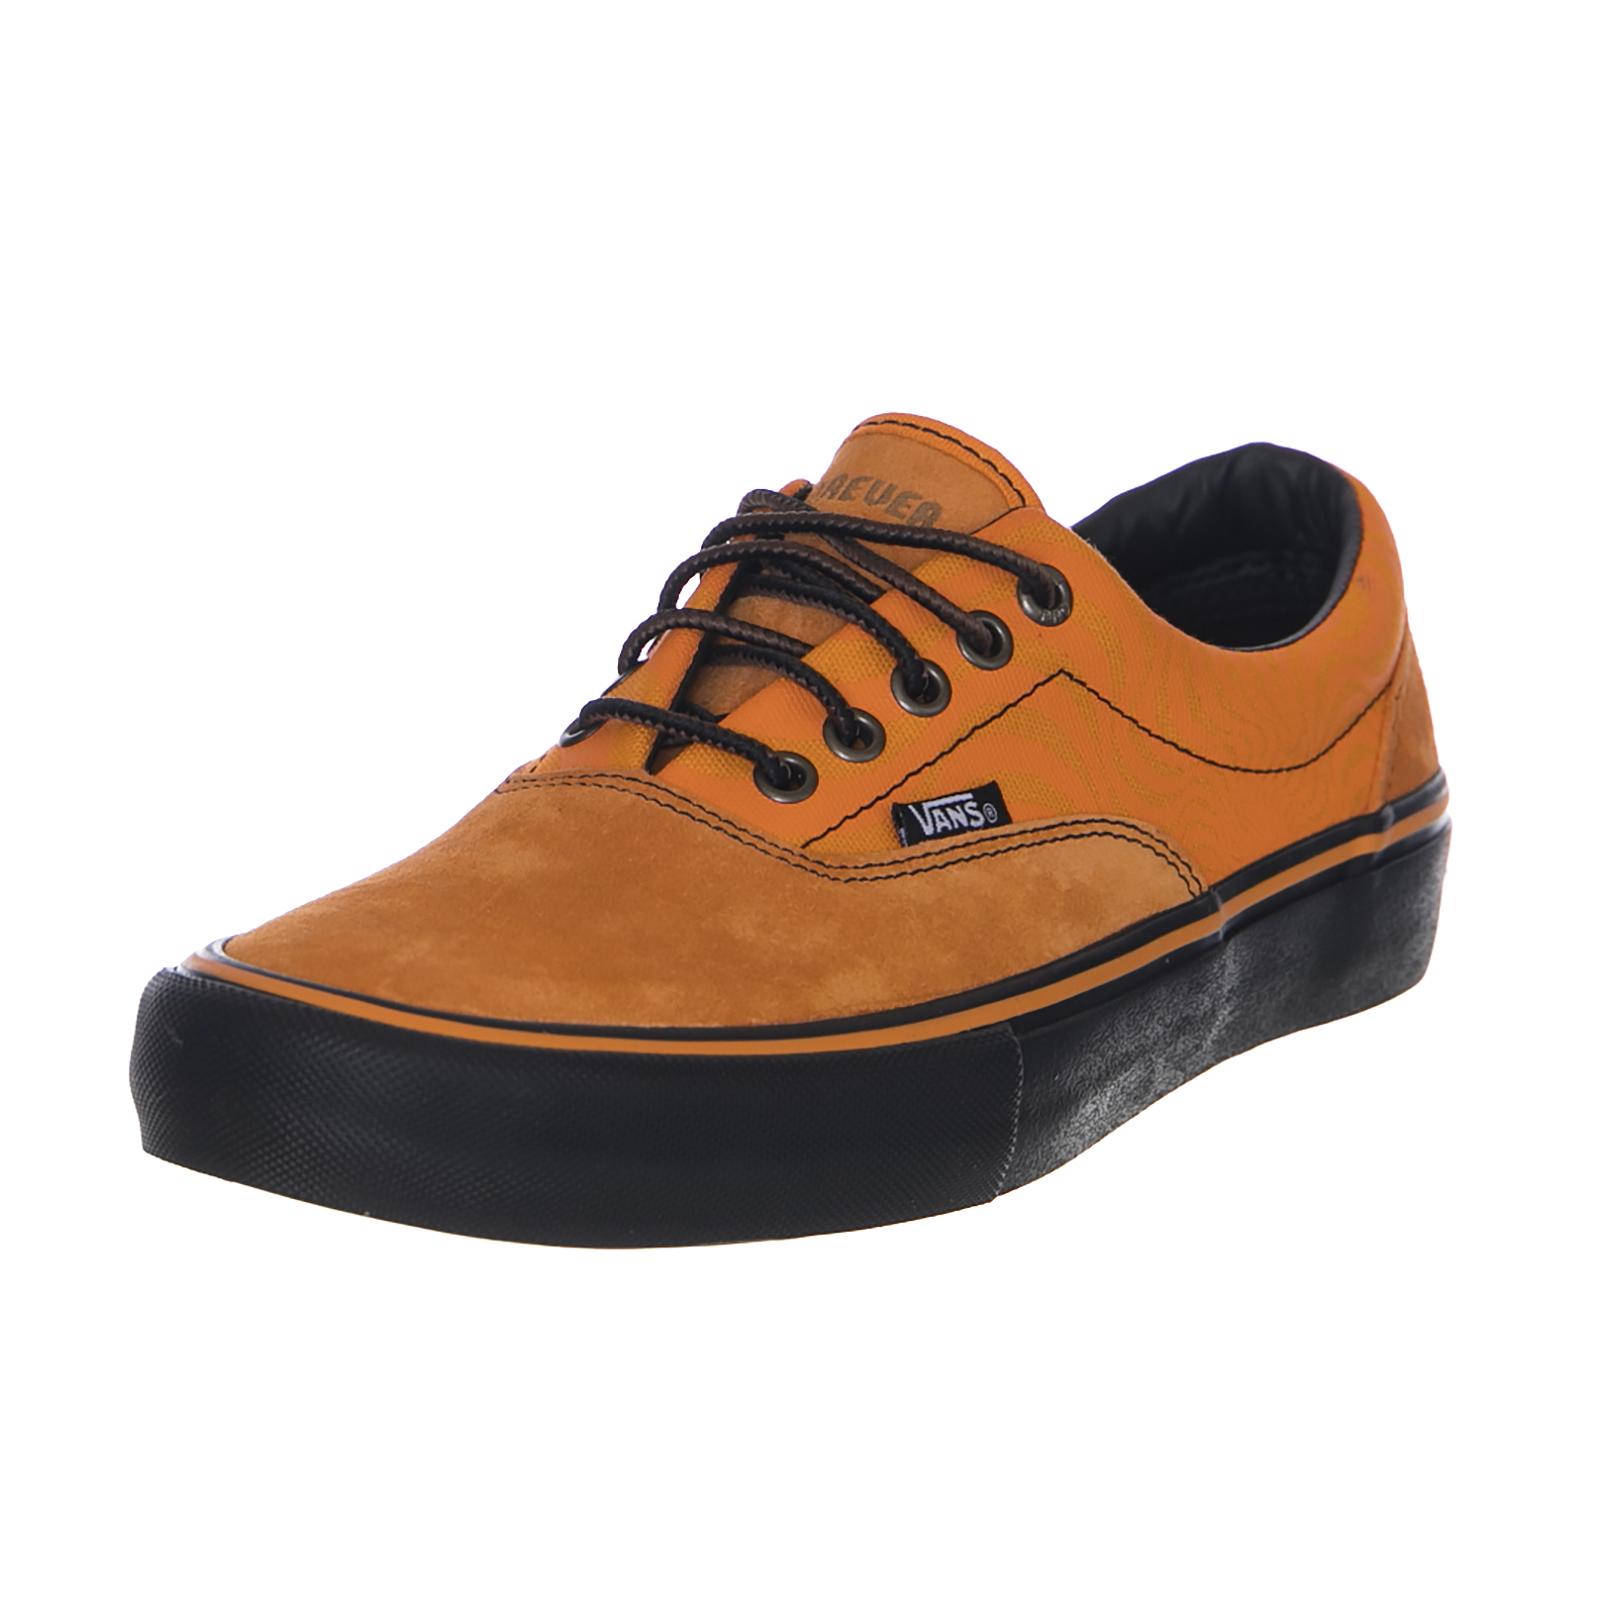 Vans Baskets Era Pro (Spitfire) Copper Brun